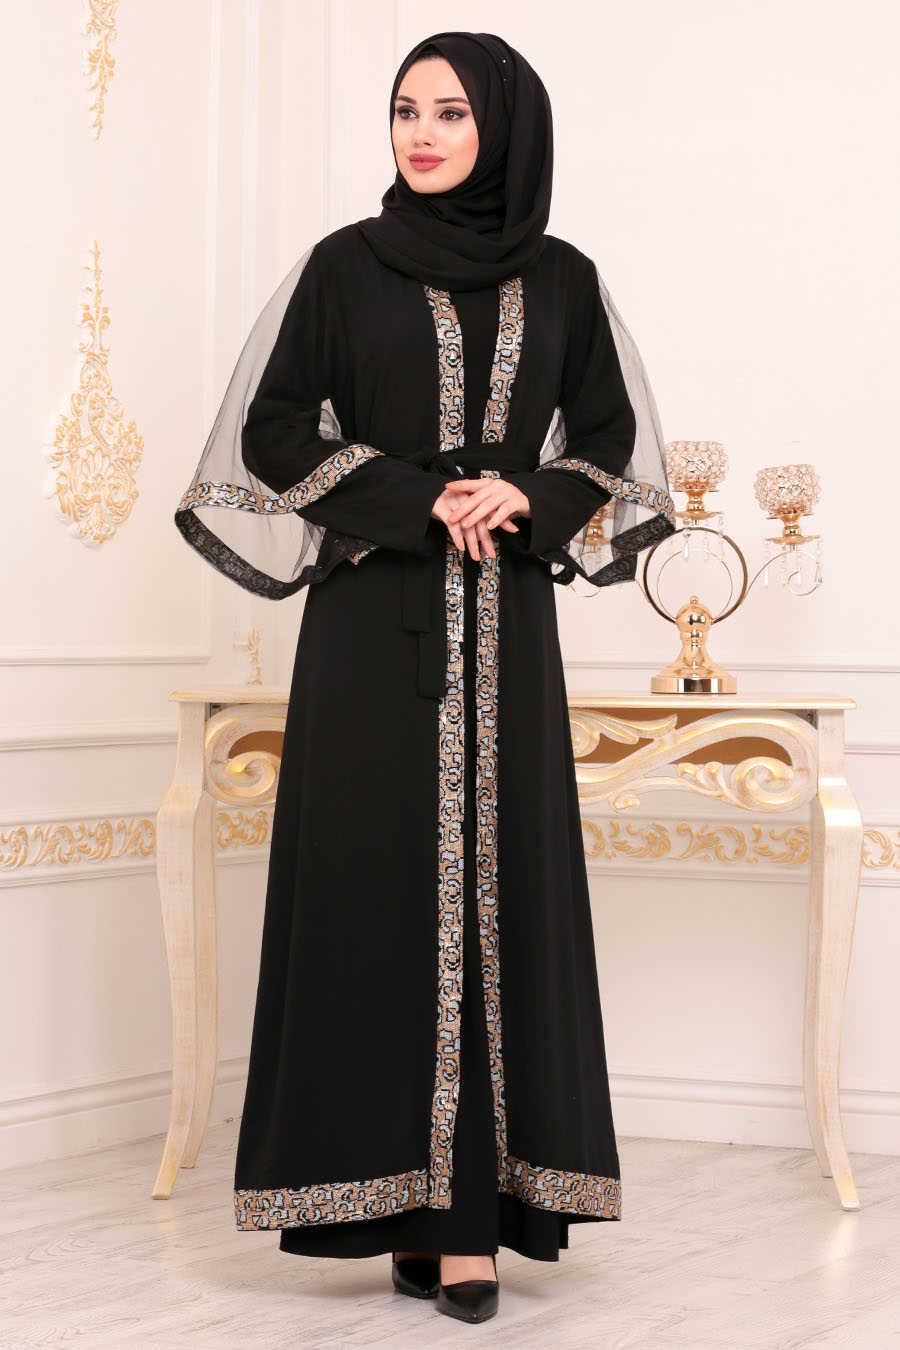 Neva Style - Black Hijab Abaya 95840S